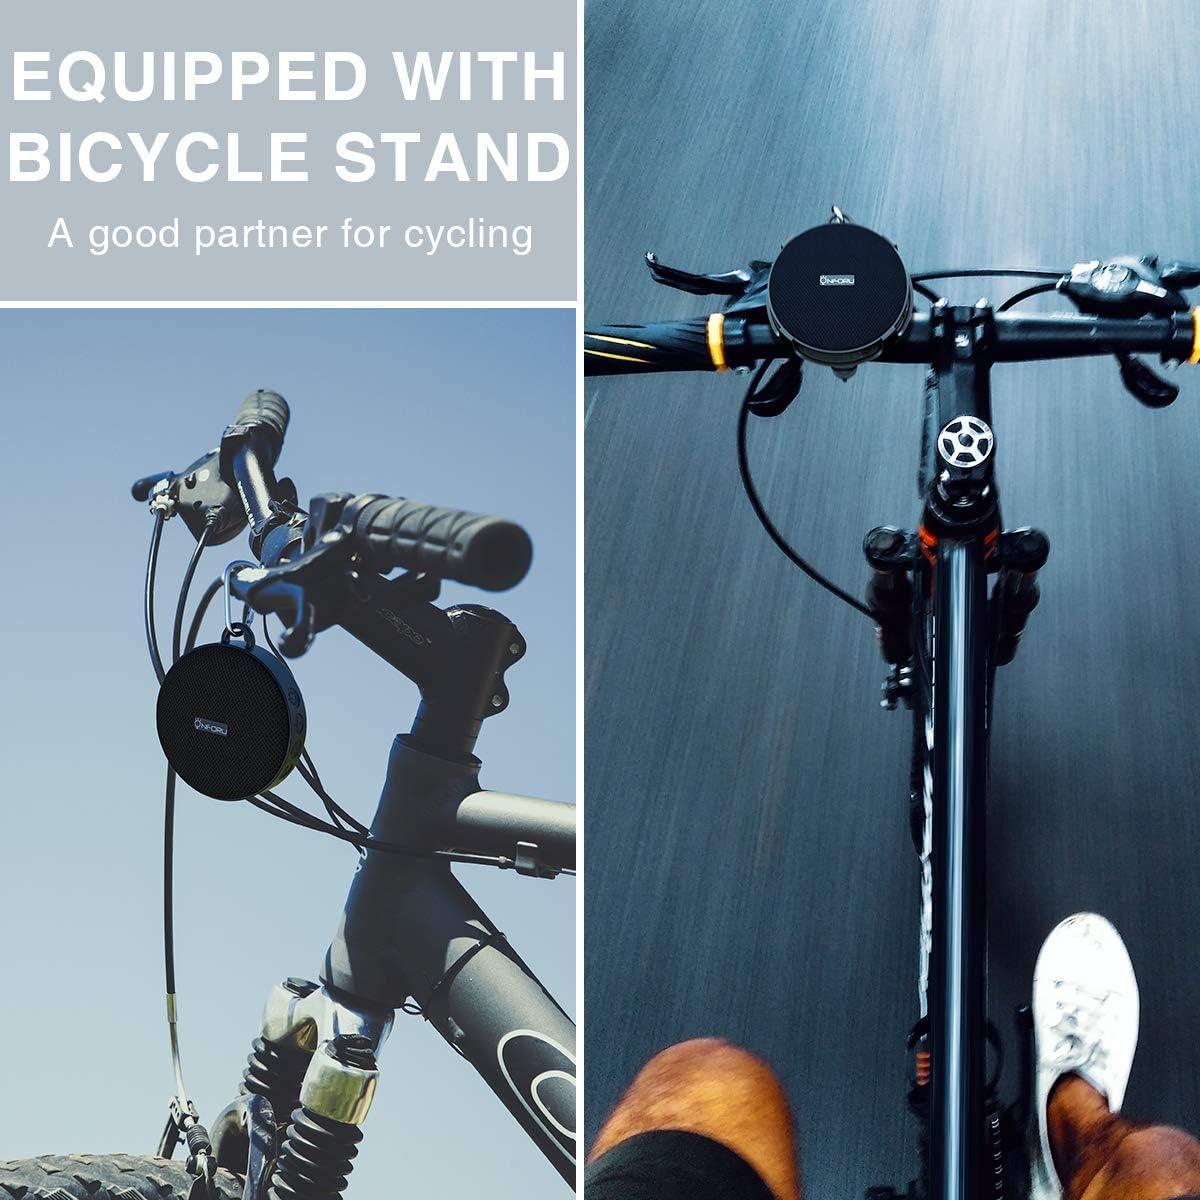 Onforu Altavoz Portátil Bluetooth Bicicleta, Speaker Inalámbrico ...